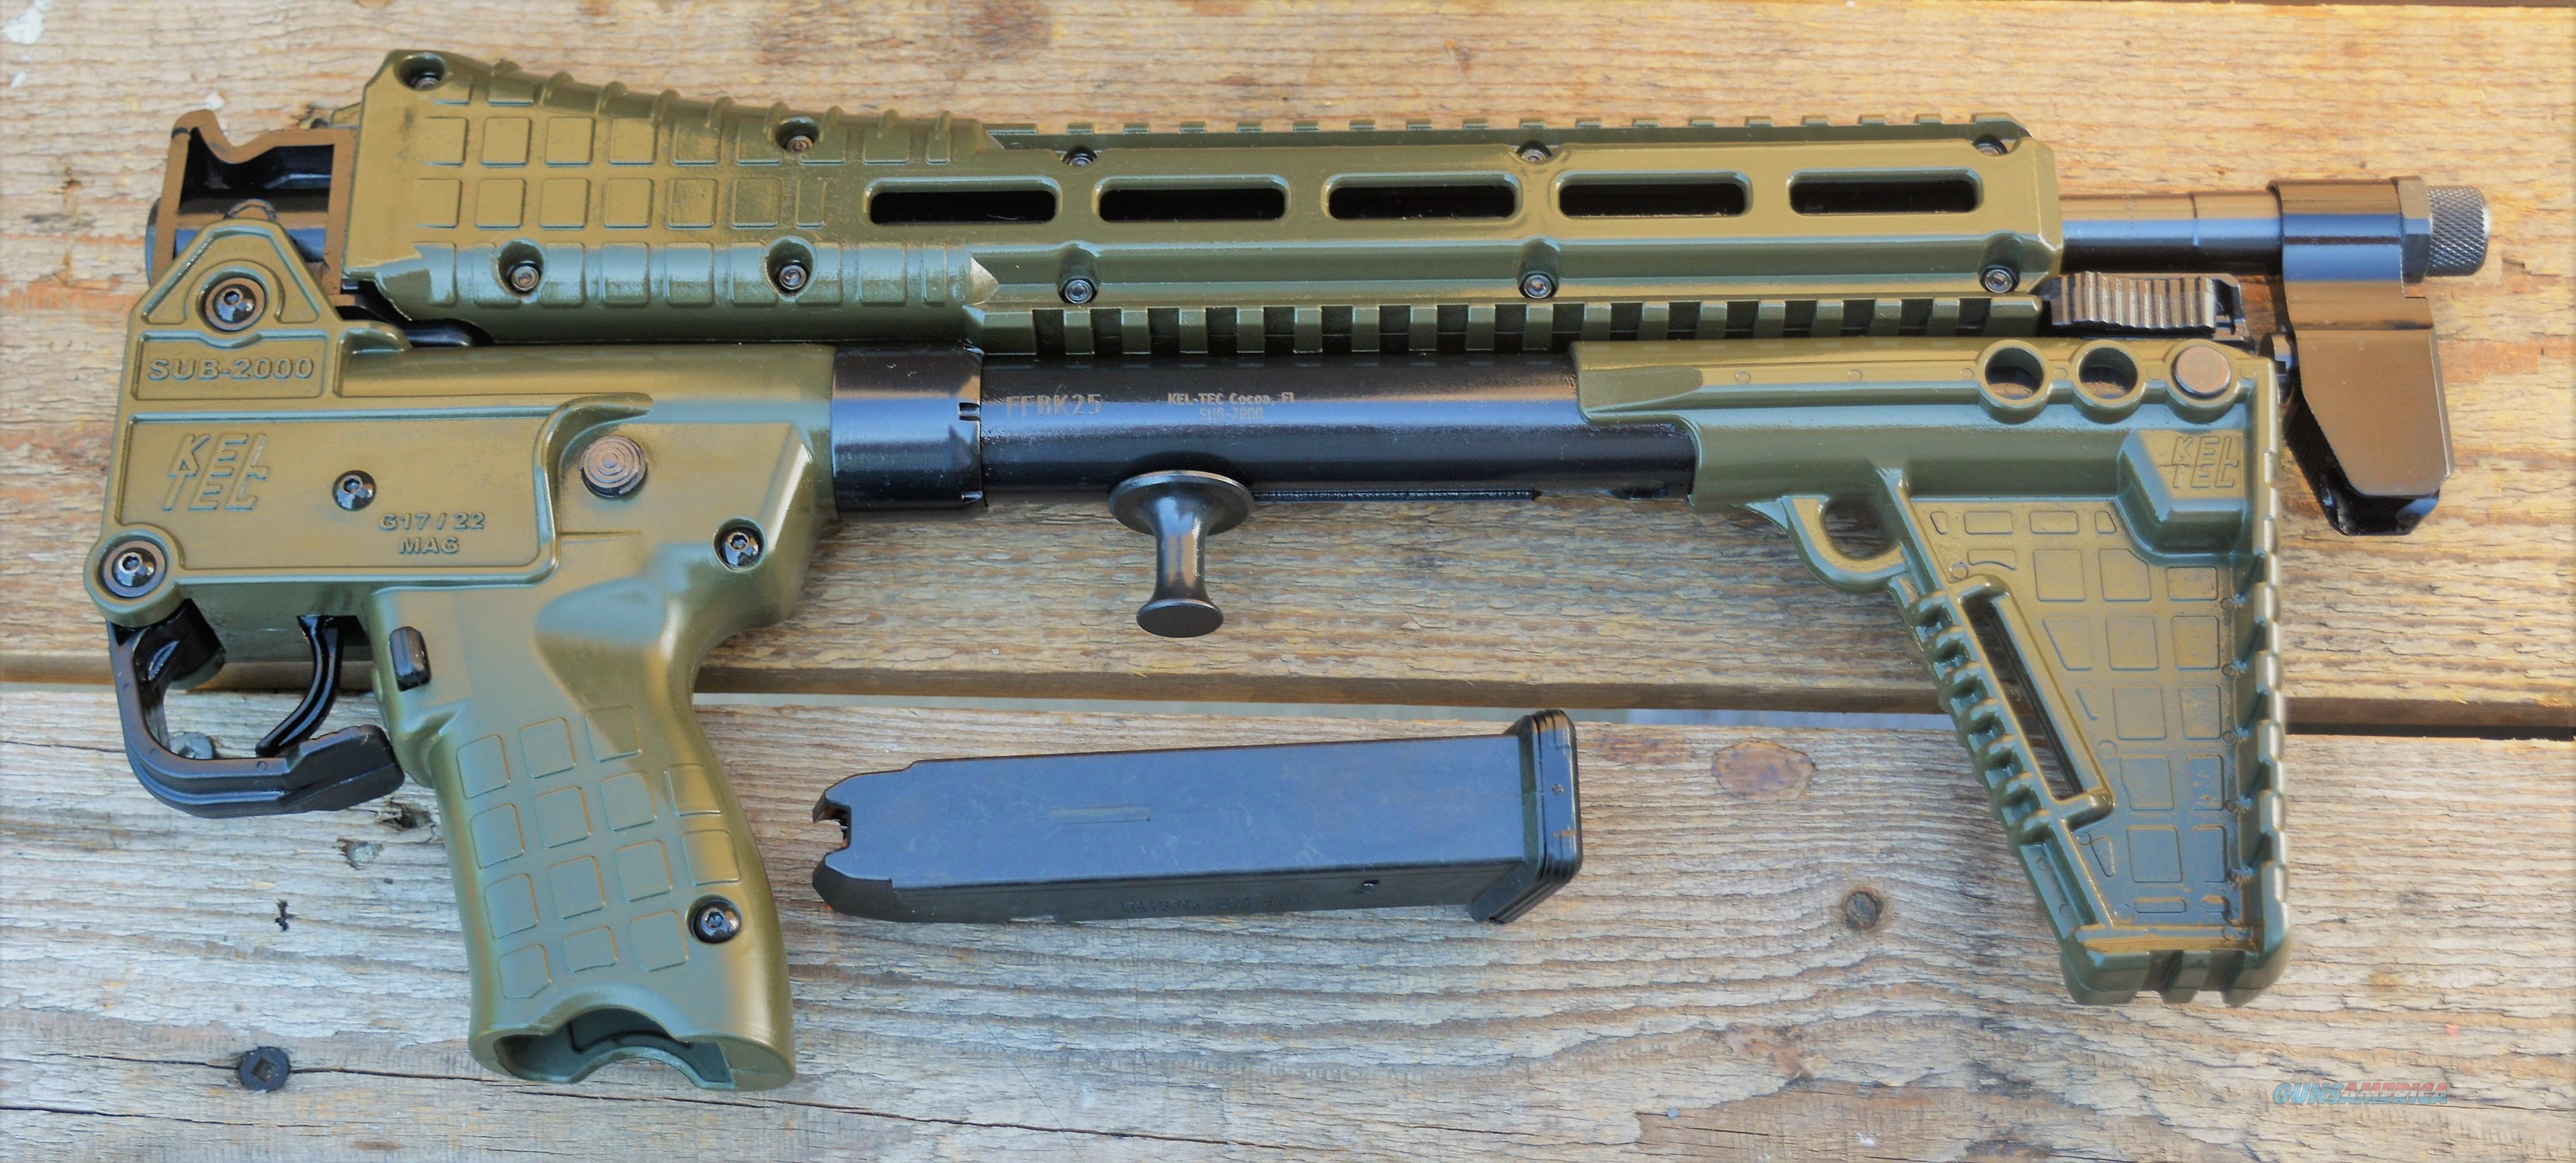 "$47 EASY PAY Kel-tec sub-2000 folding GREEN ""Gator Grip"" NO SALE TO CALIFORNIA SYNTHETIC 3-position adjustable stock texture Picatinny rails USES Glock 9mm magazine Amo  sling attachment SUB9G17GRNHC sub2000   Guns > Rifles > Kel-Tec Rifles"